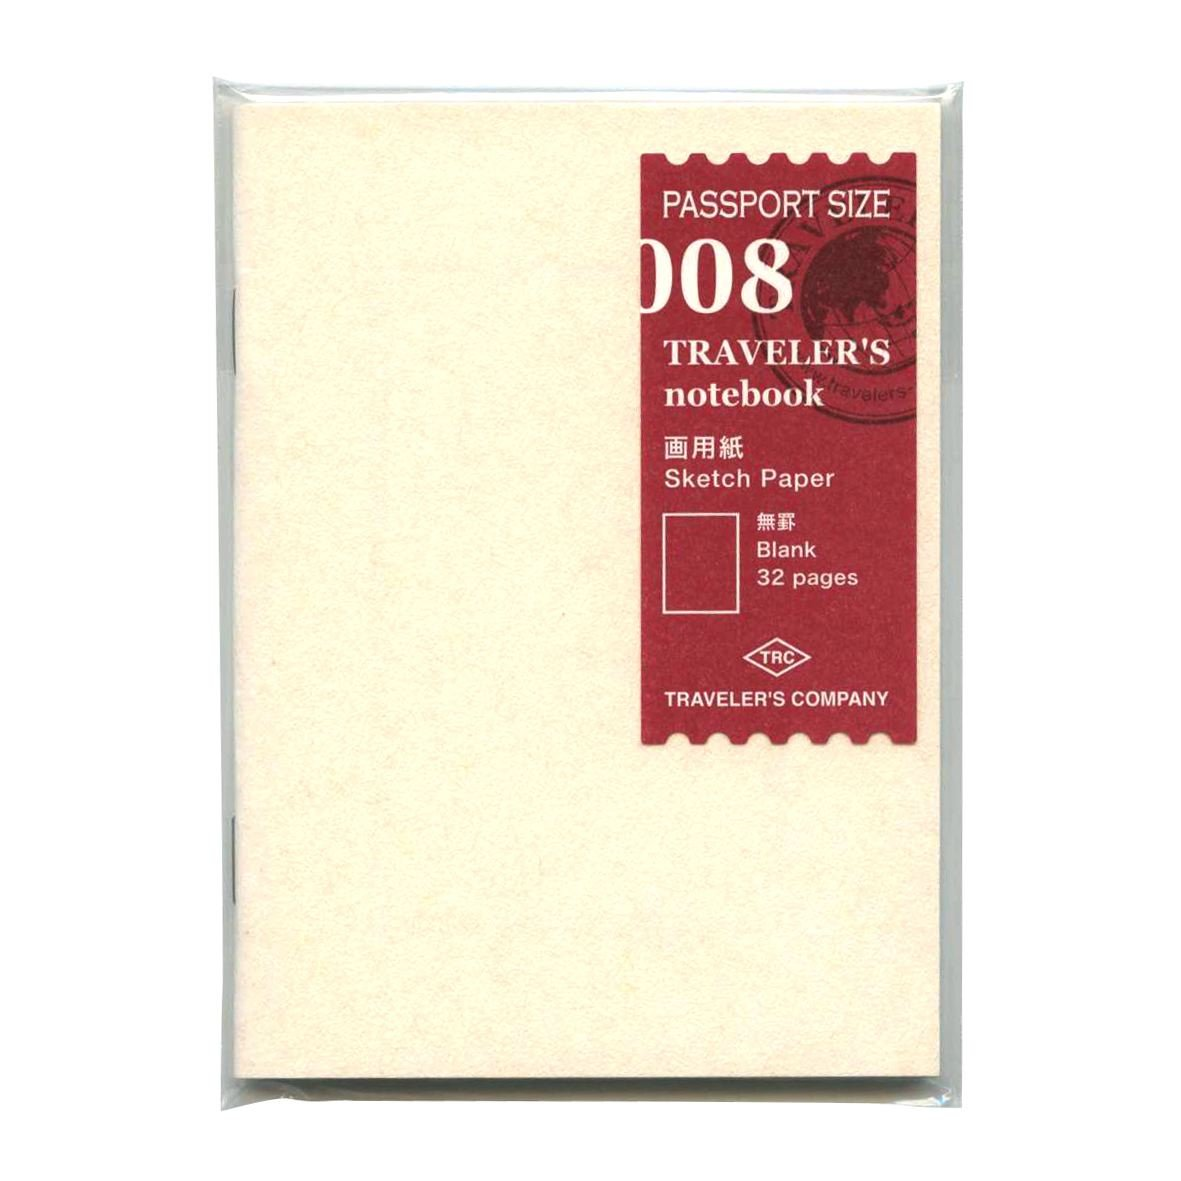 Midori Traveler's Notebook - Refill 008 (Passport Size) - Sketch Paper Notebook Designphil